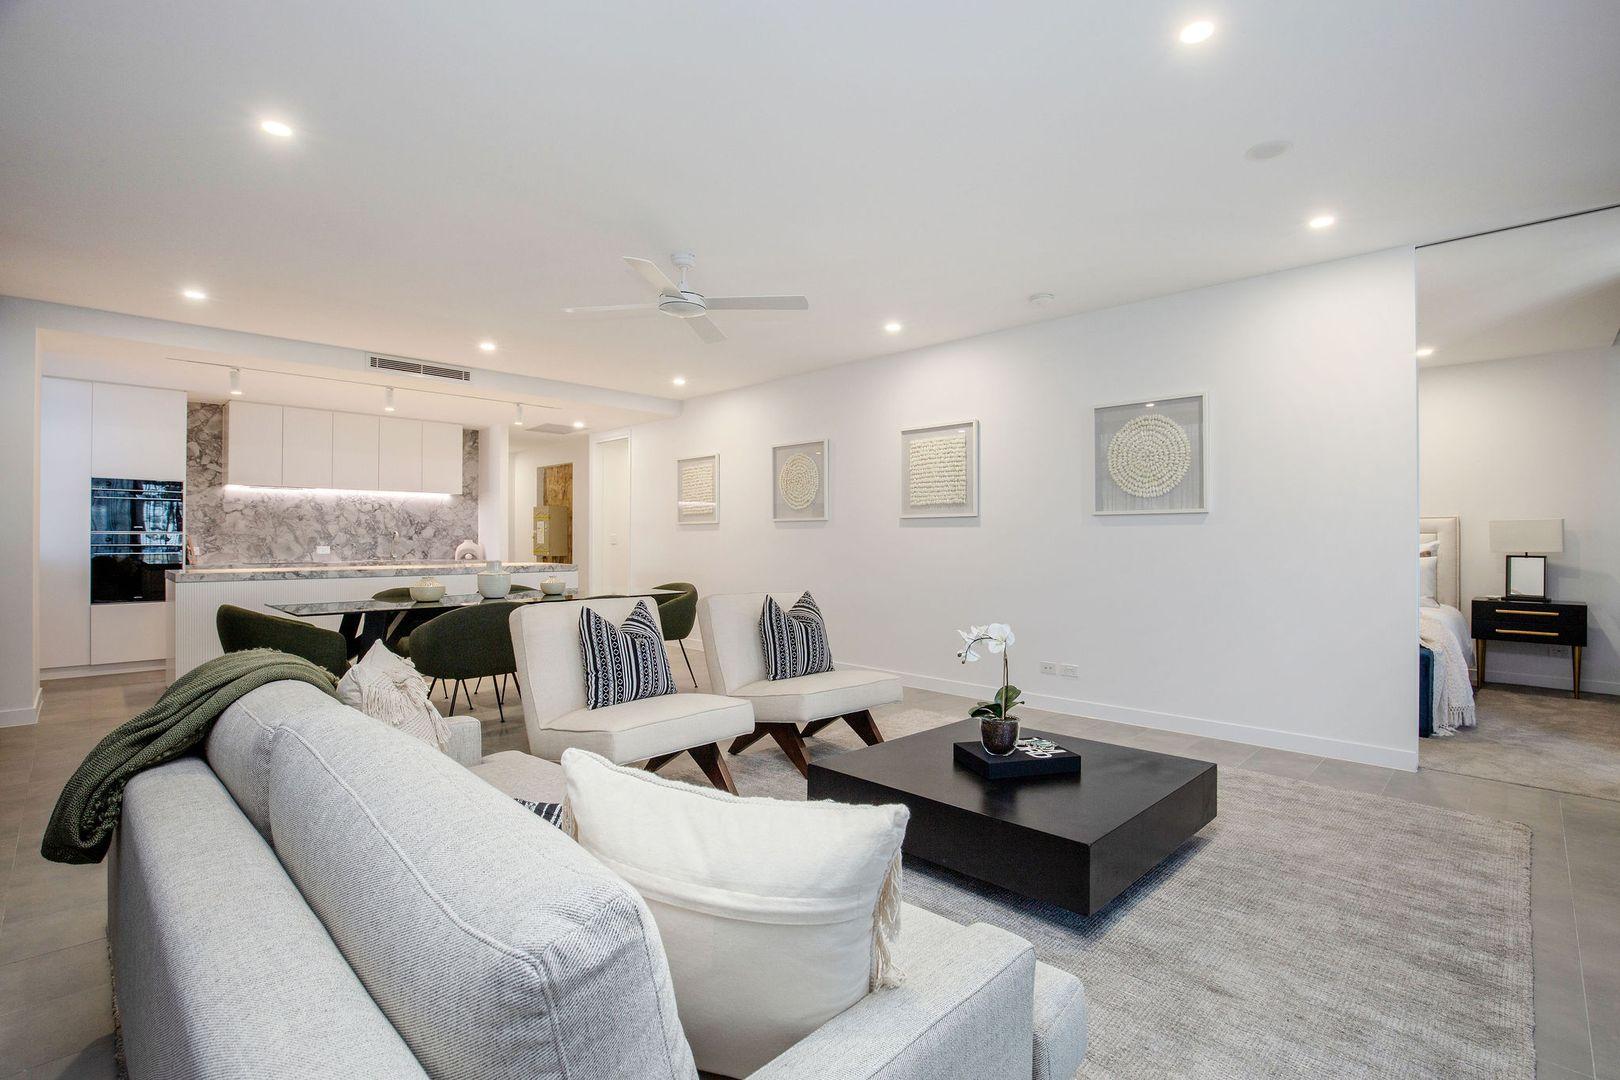 1 Coyne Street, Coolangatta, QLD 4225, Image 0